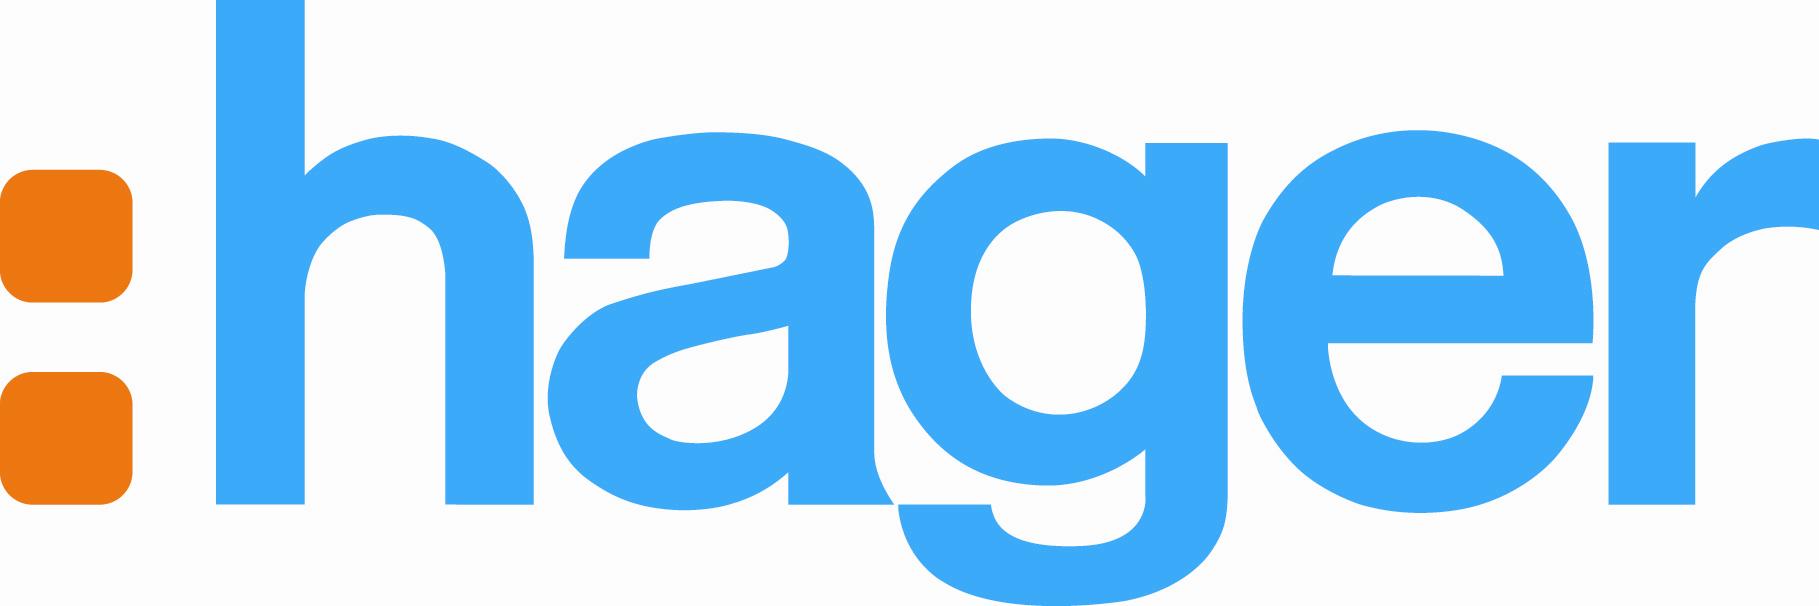 Haber-logo-partenaire